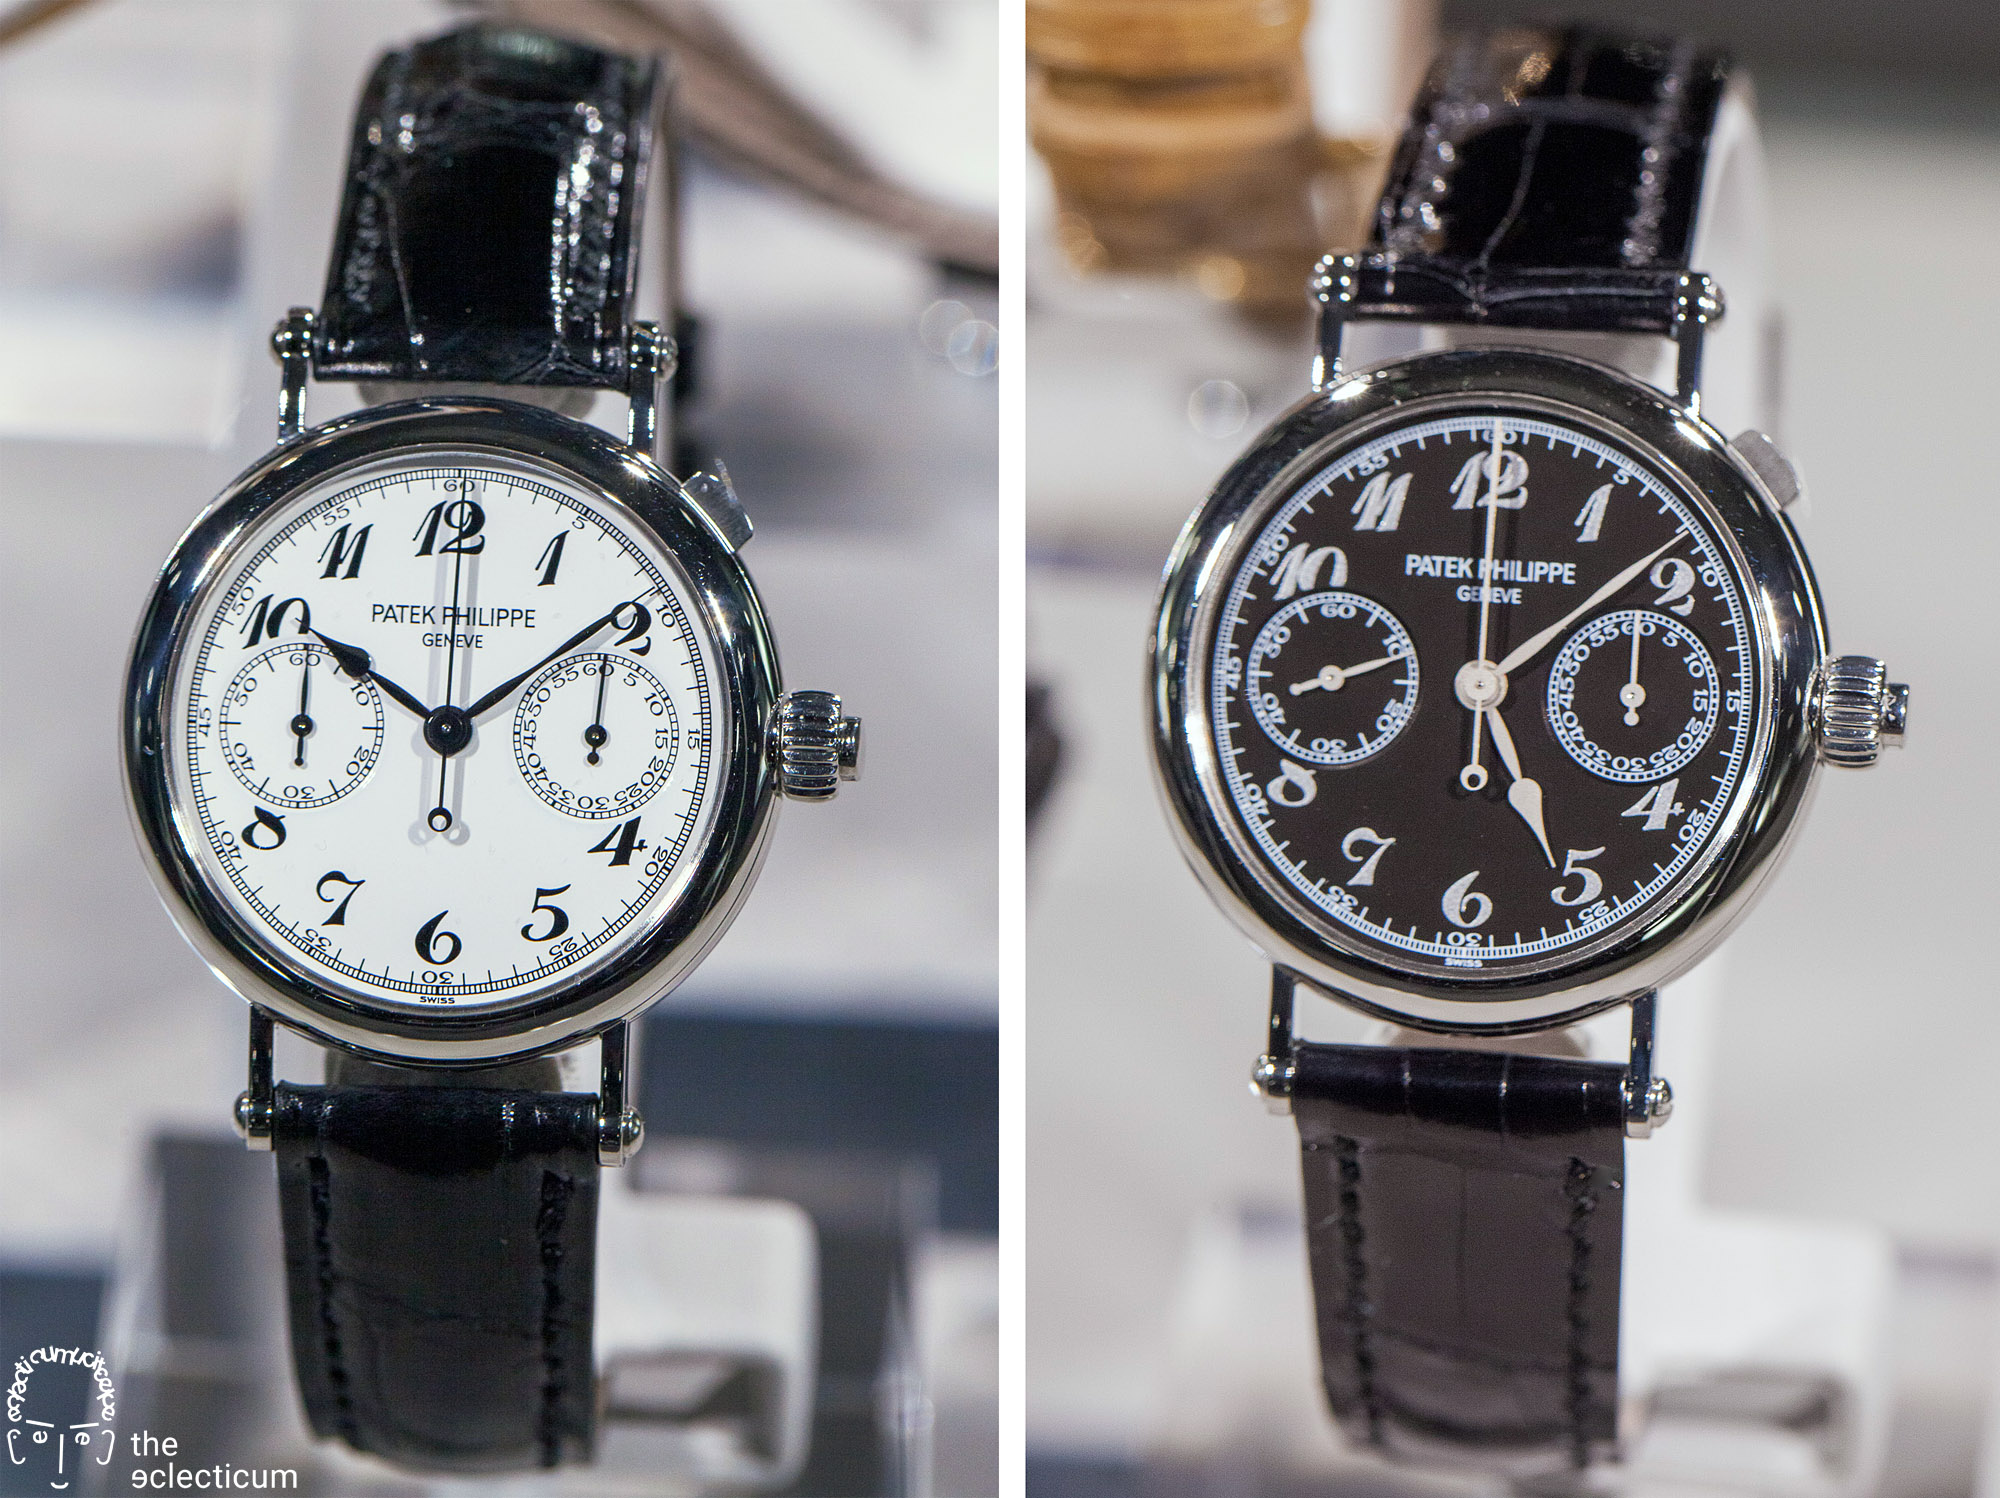 Patek Philippe Split seconds chronograph rattrapante 5959 monopusher